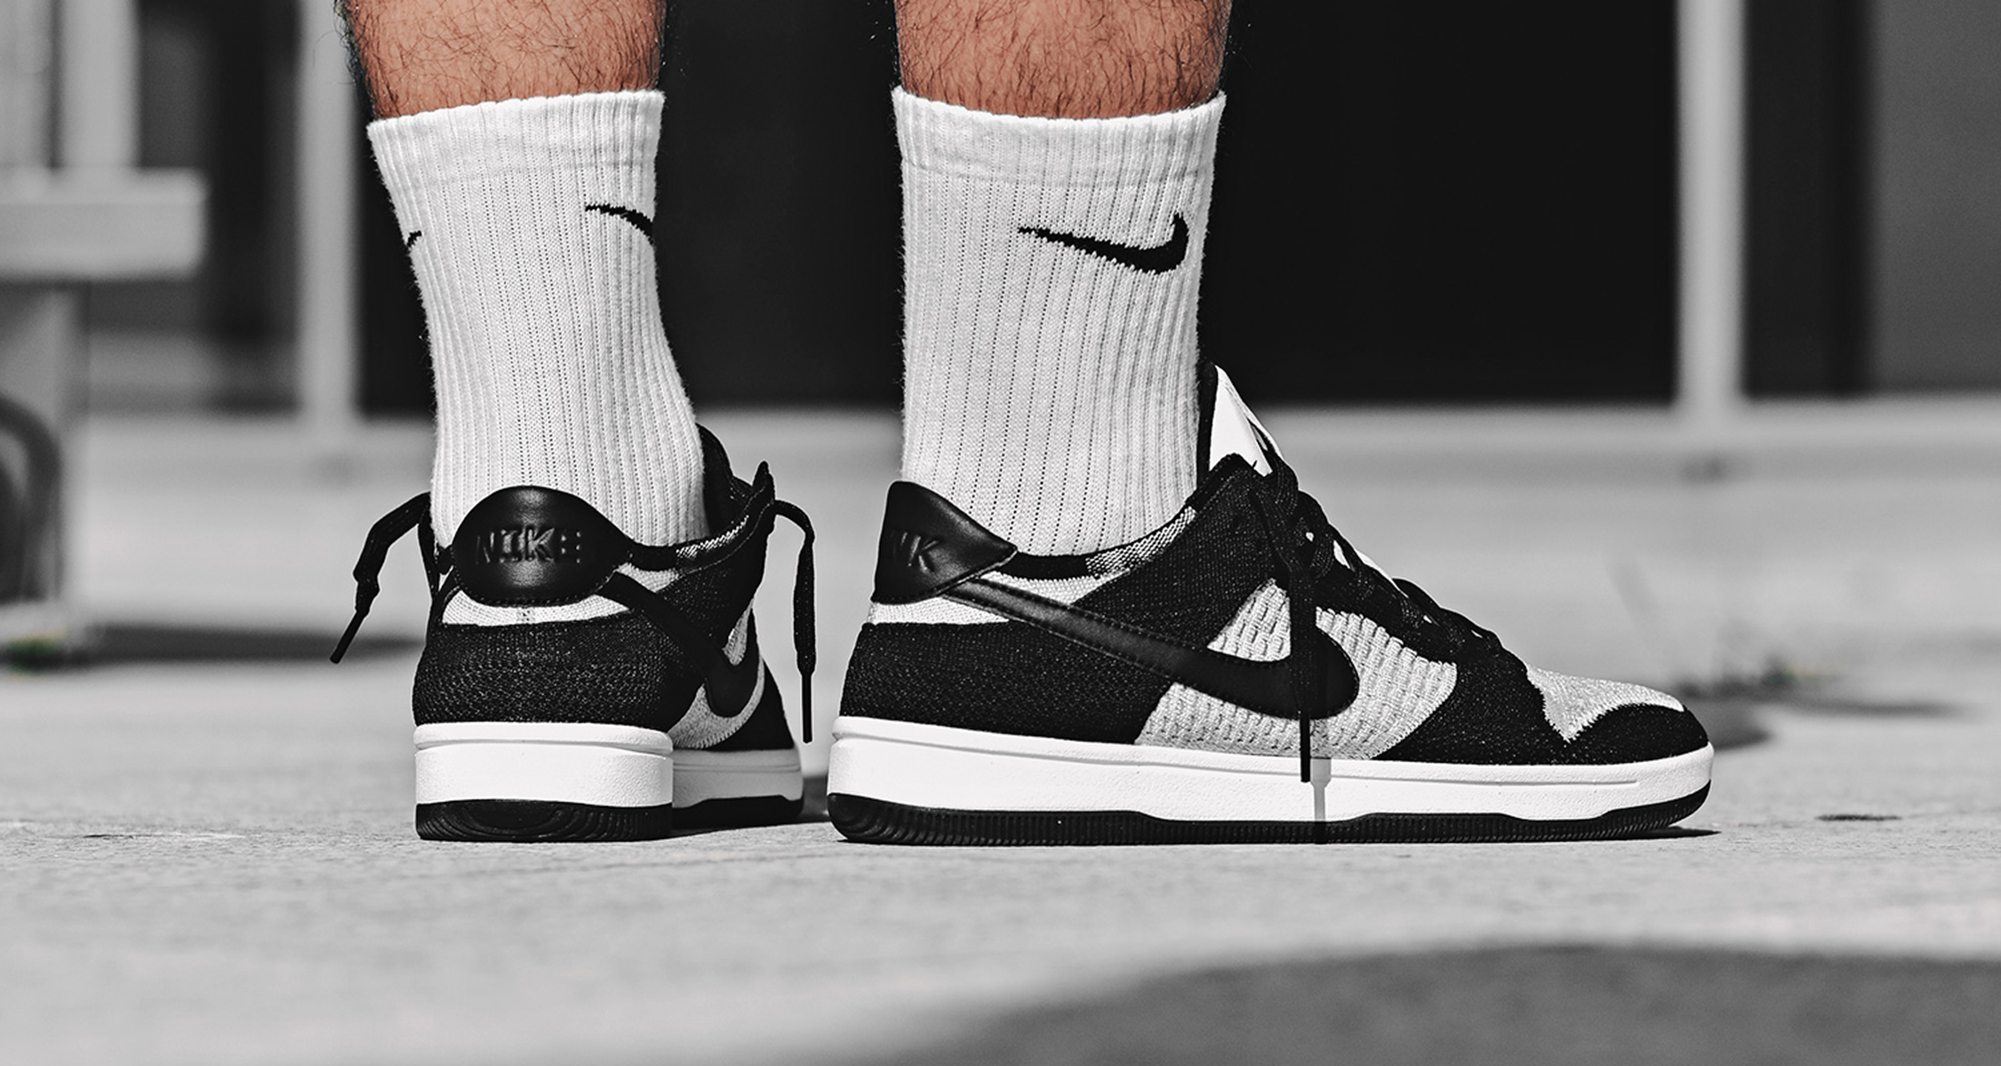 Nike Dunk Low Flyknit Black/White